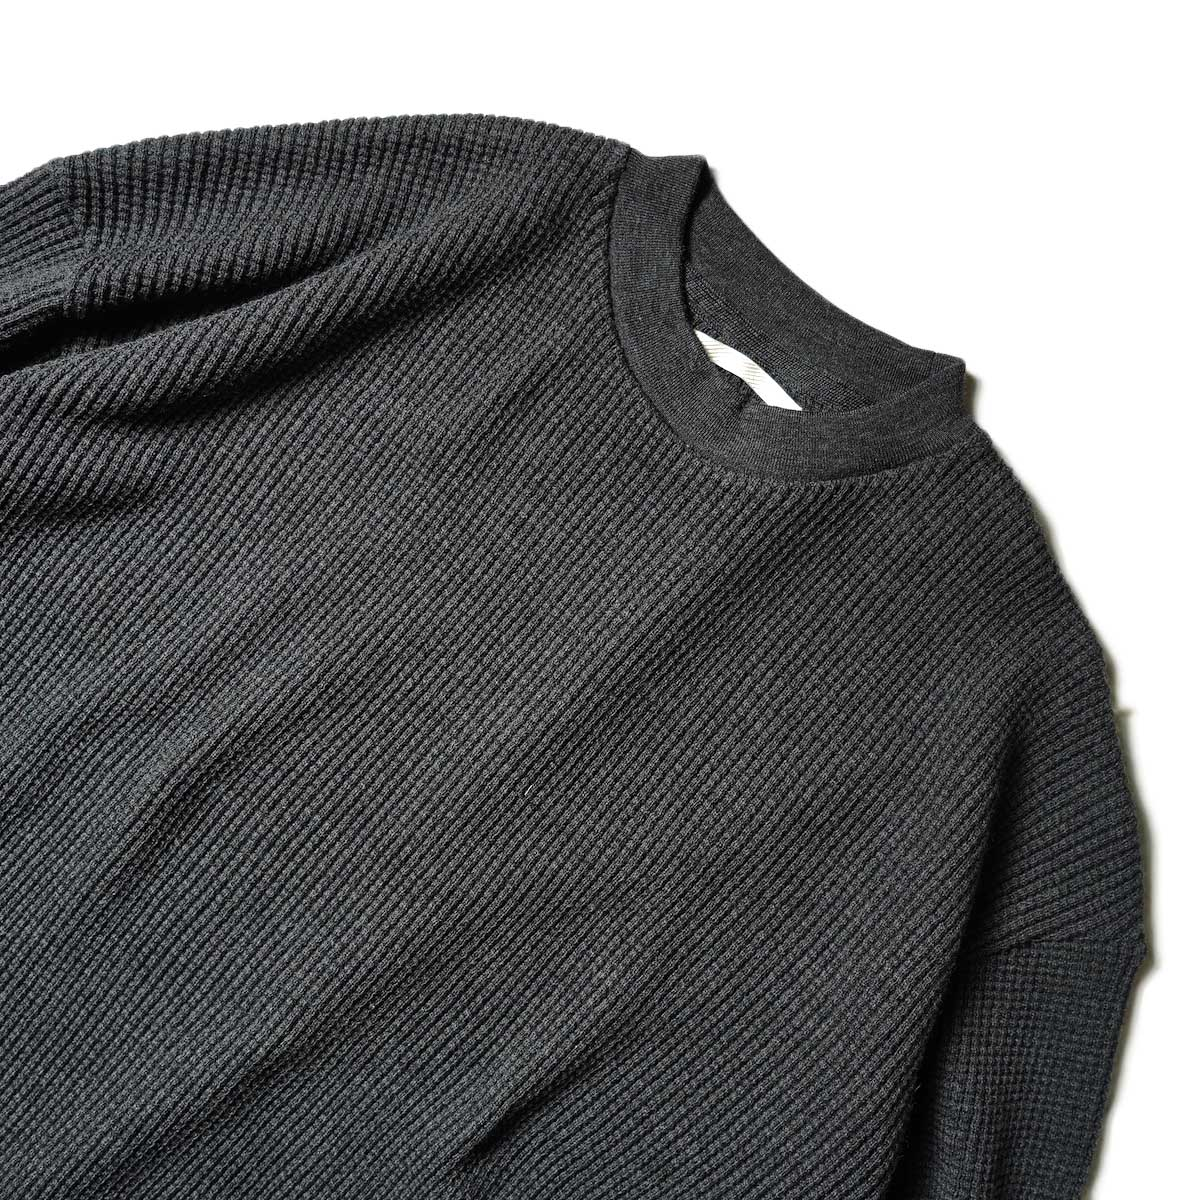 blurhms / Wool Cotton Big Waffle Crew-Neck (Heather Charcoal)ネック